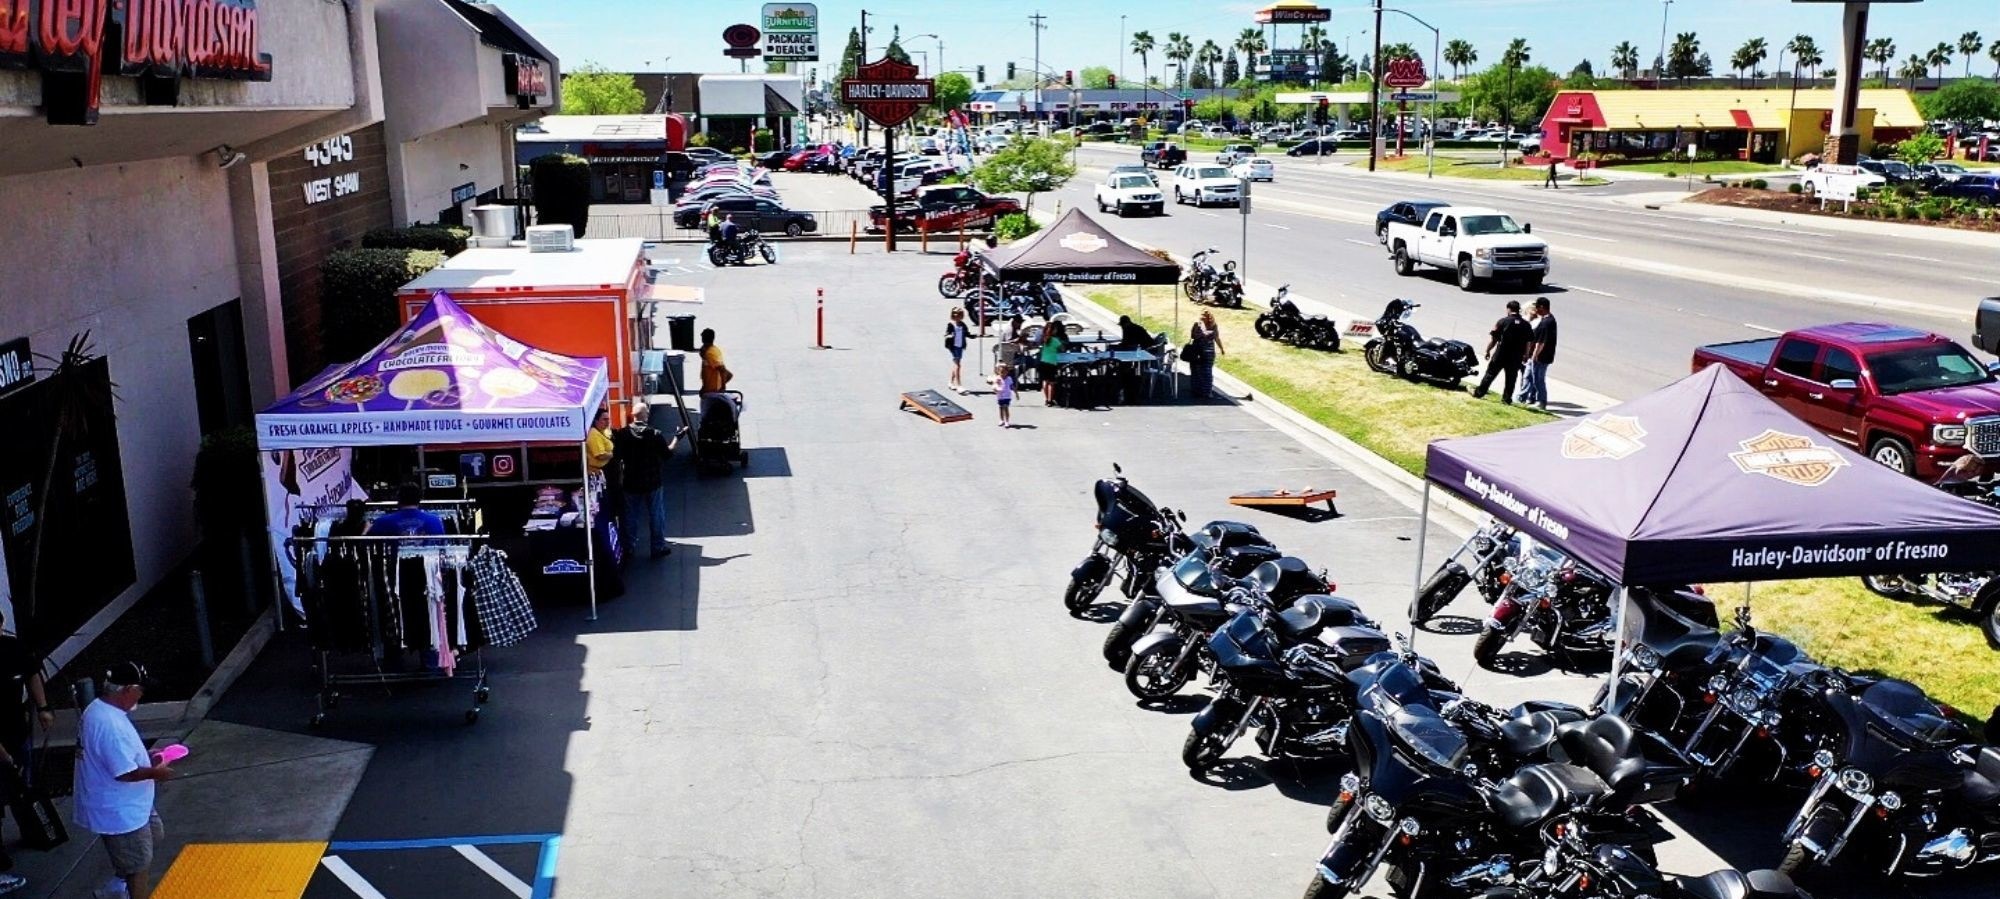 New & Used Motorcycle Dealer | Harley-Davidson® of Fresno